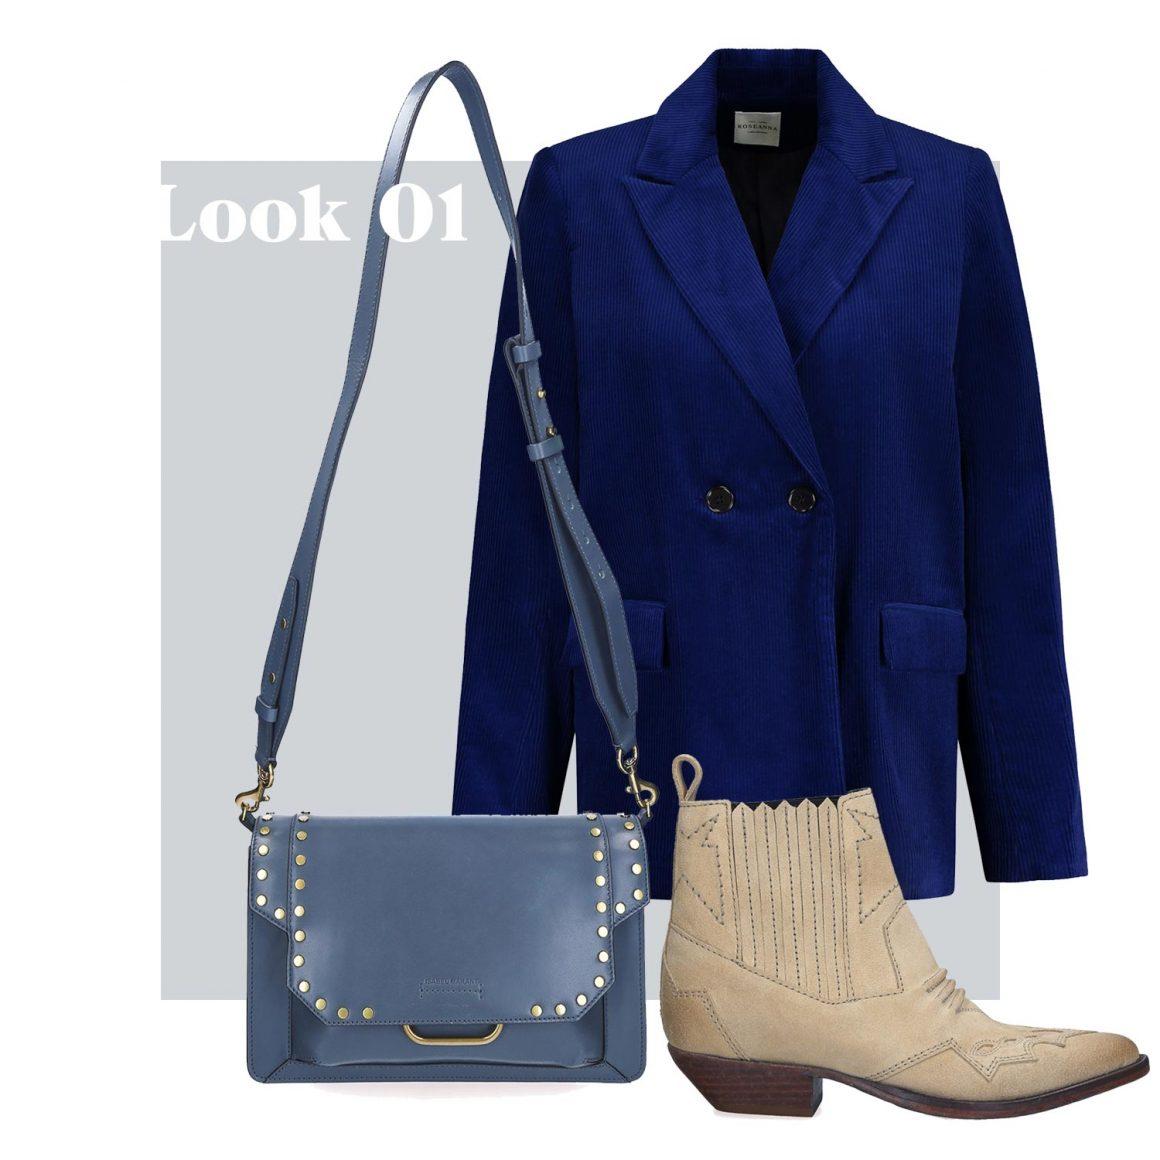 Sac à main Isabel Marant, blazer et boots Roseanna